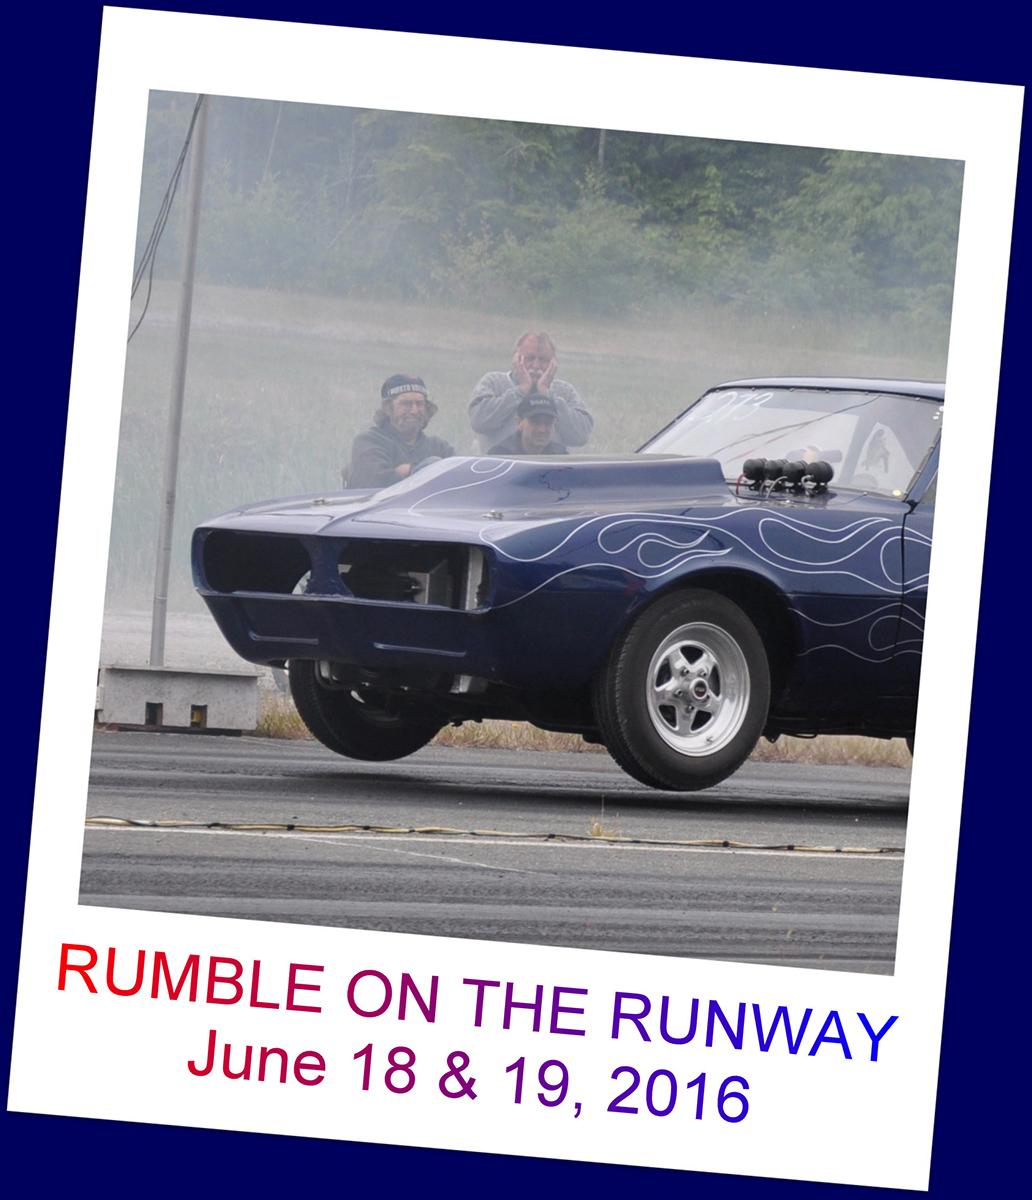 Rumble on the Runway June 18 & 19, 2016 1202